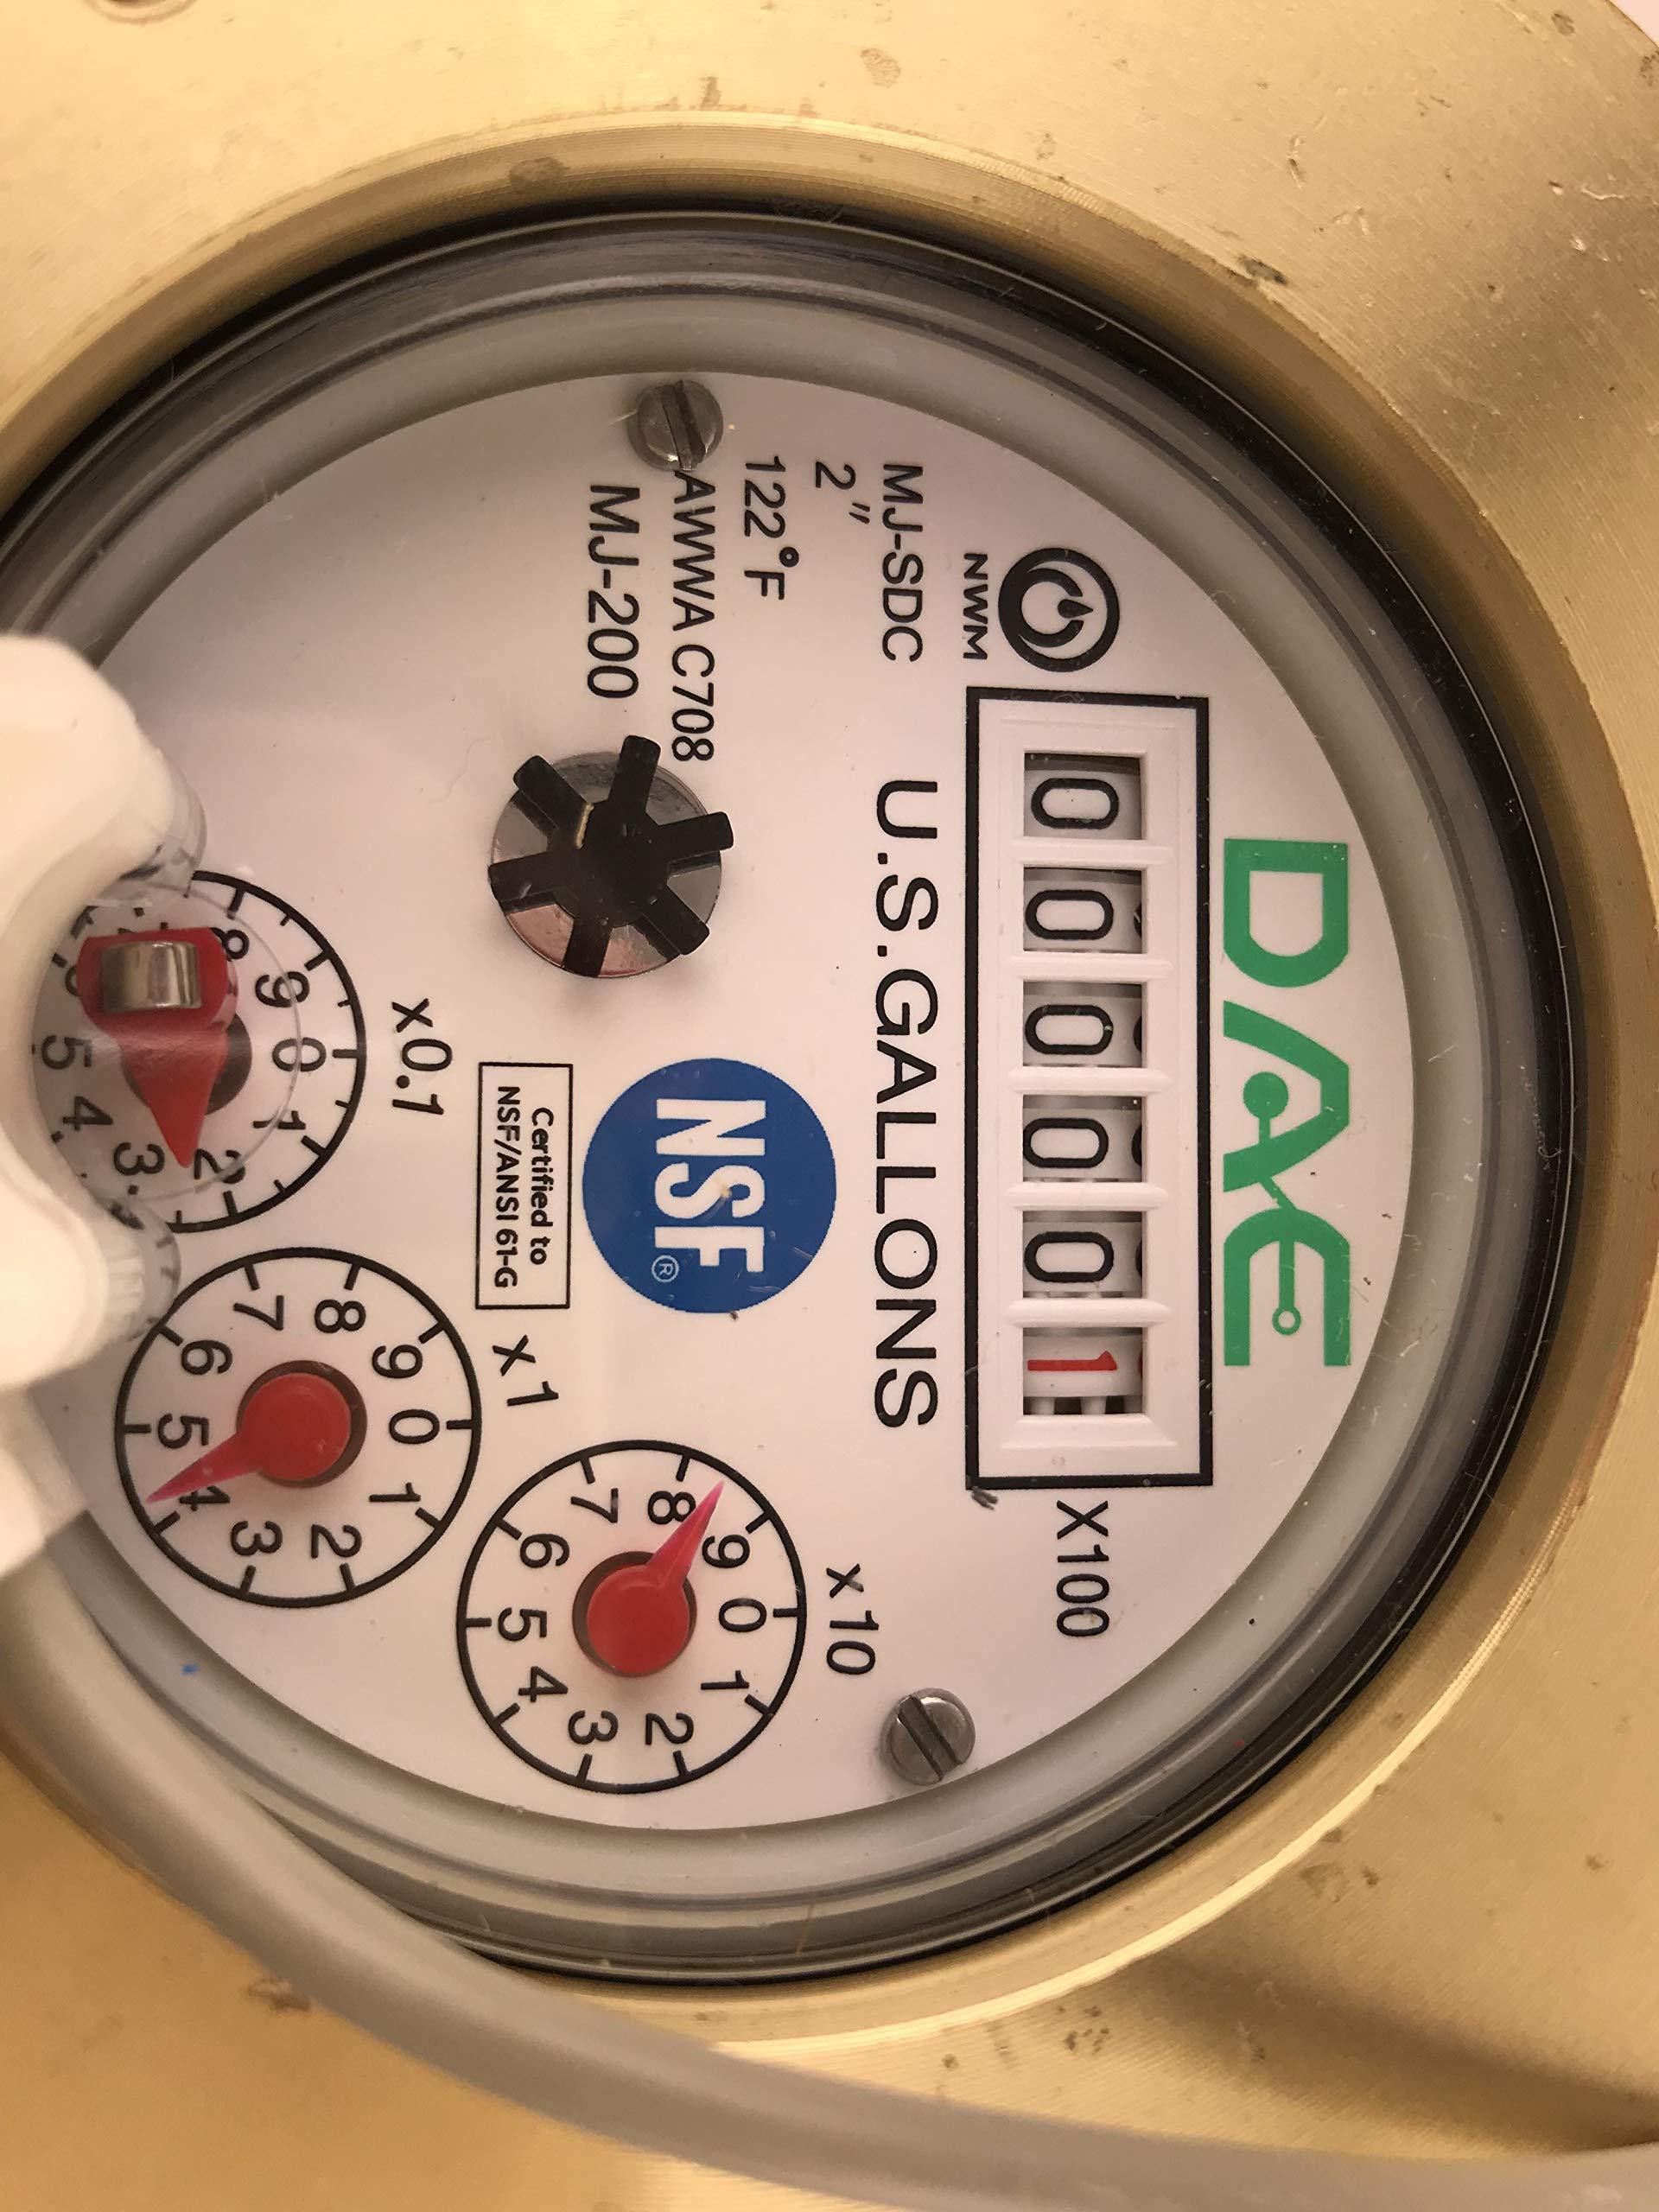 DAE MJ-200 2'' NSF61 Lead Free Potable Water Meter, Pulse Output + Couplings by DAE